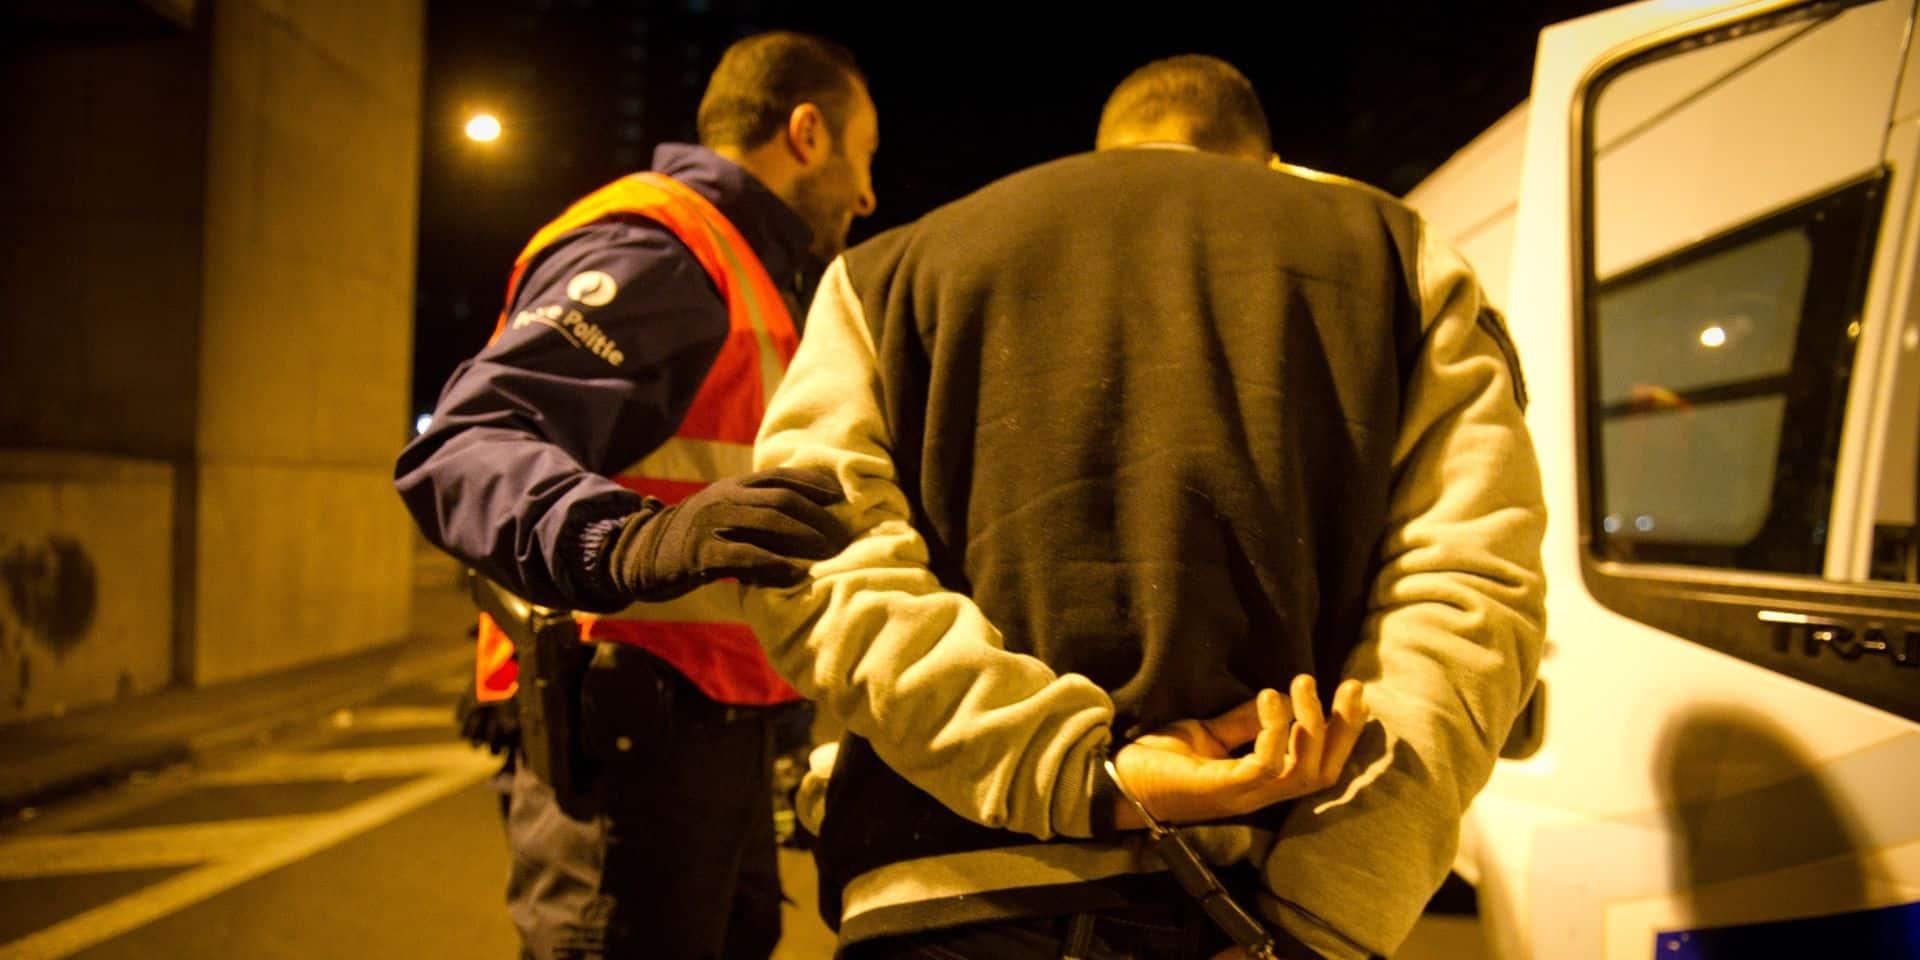 Droixhe : dealer intercepté